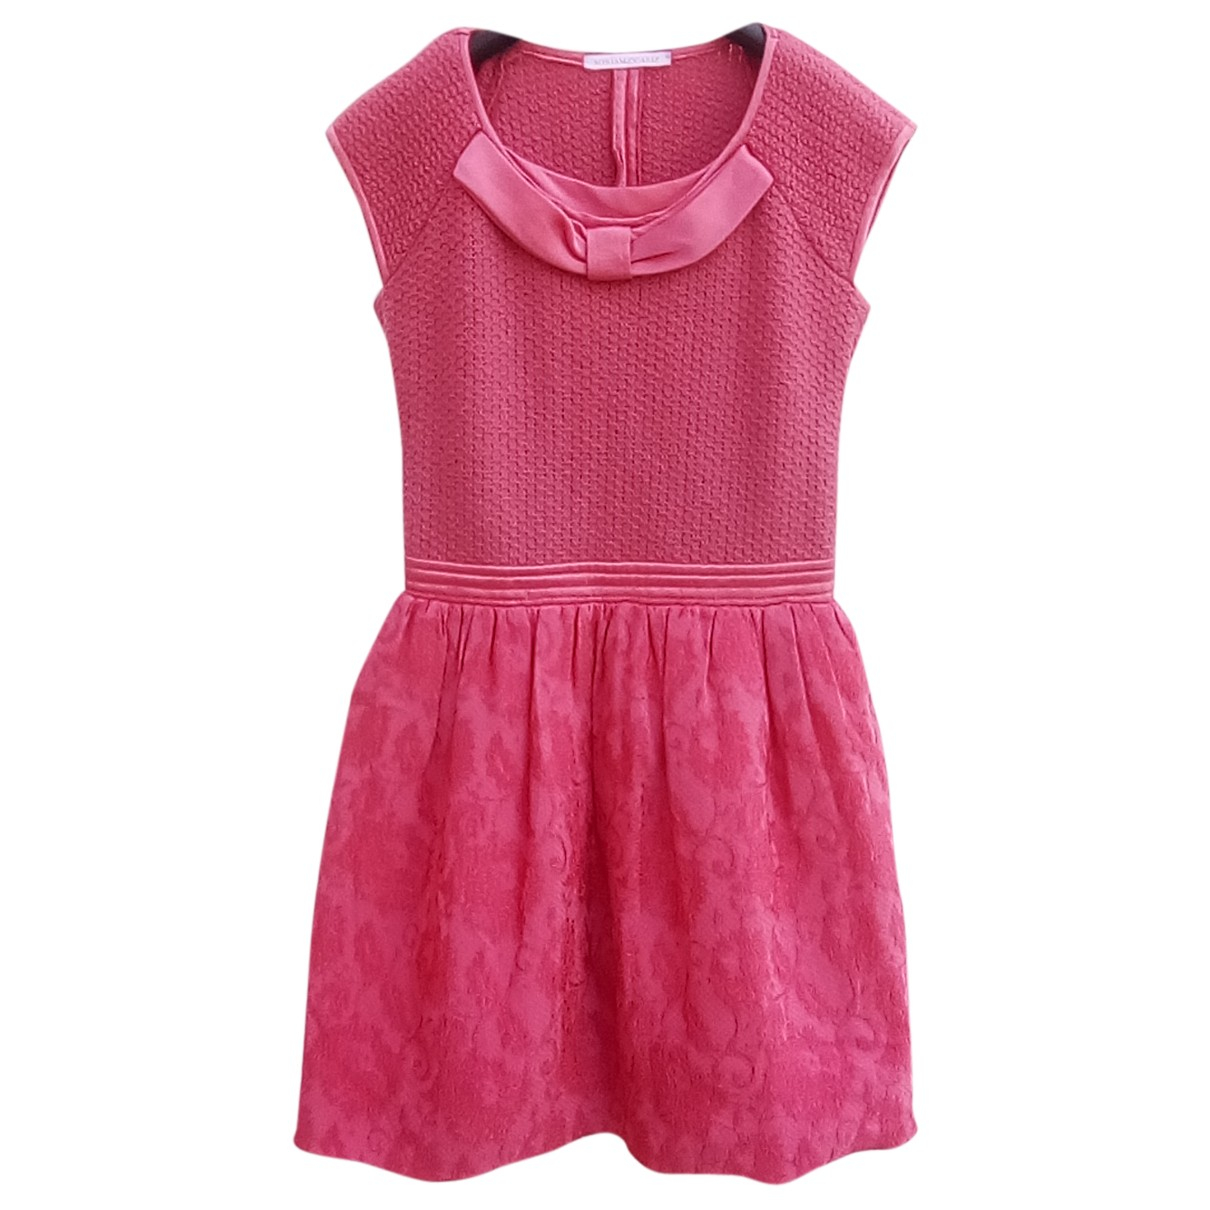 Miriam Ocariz \N Kleid in  Rosa Wolle